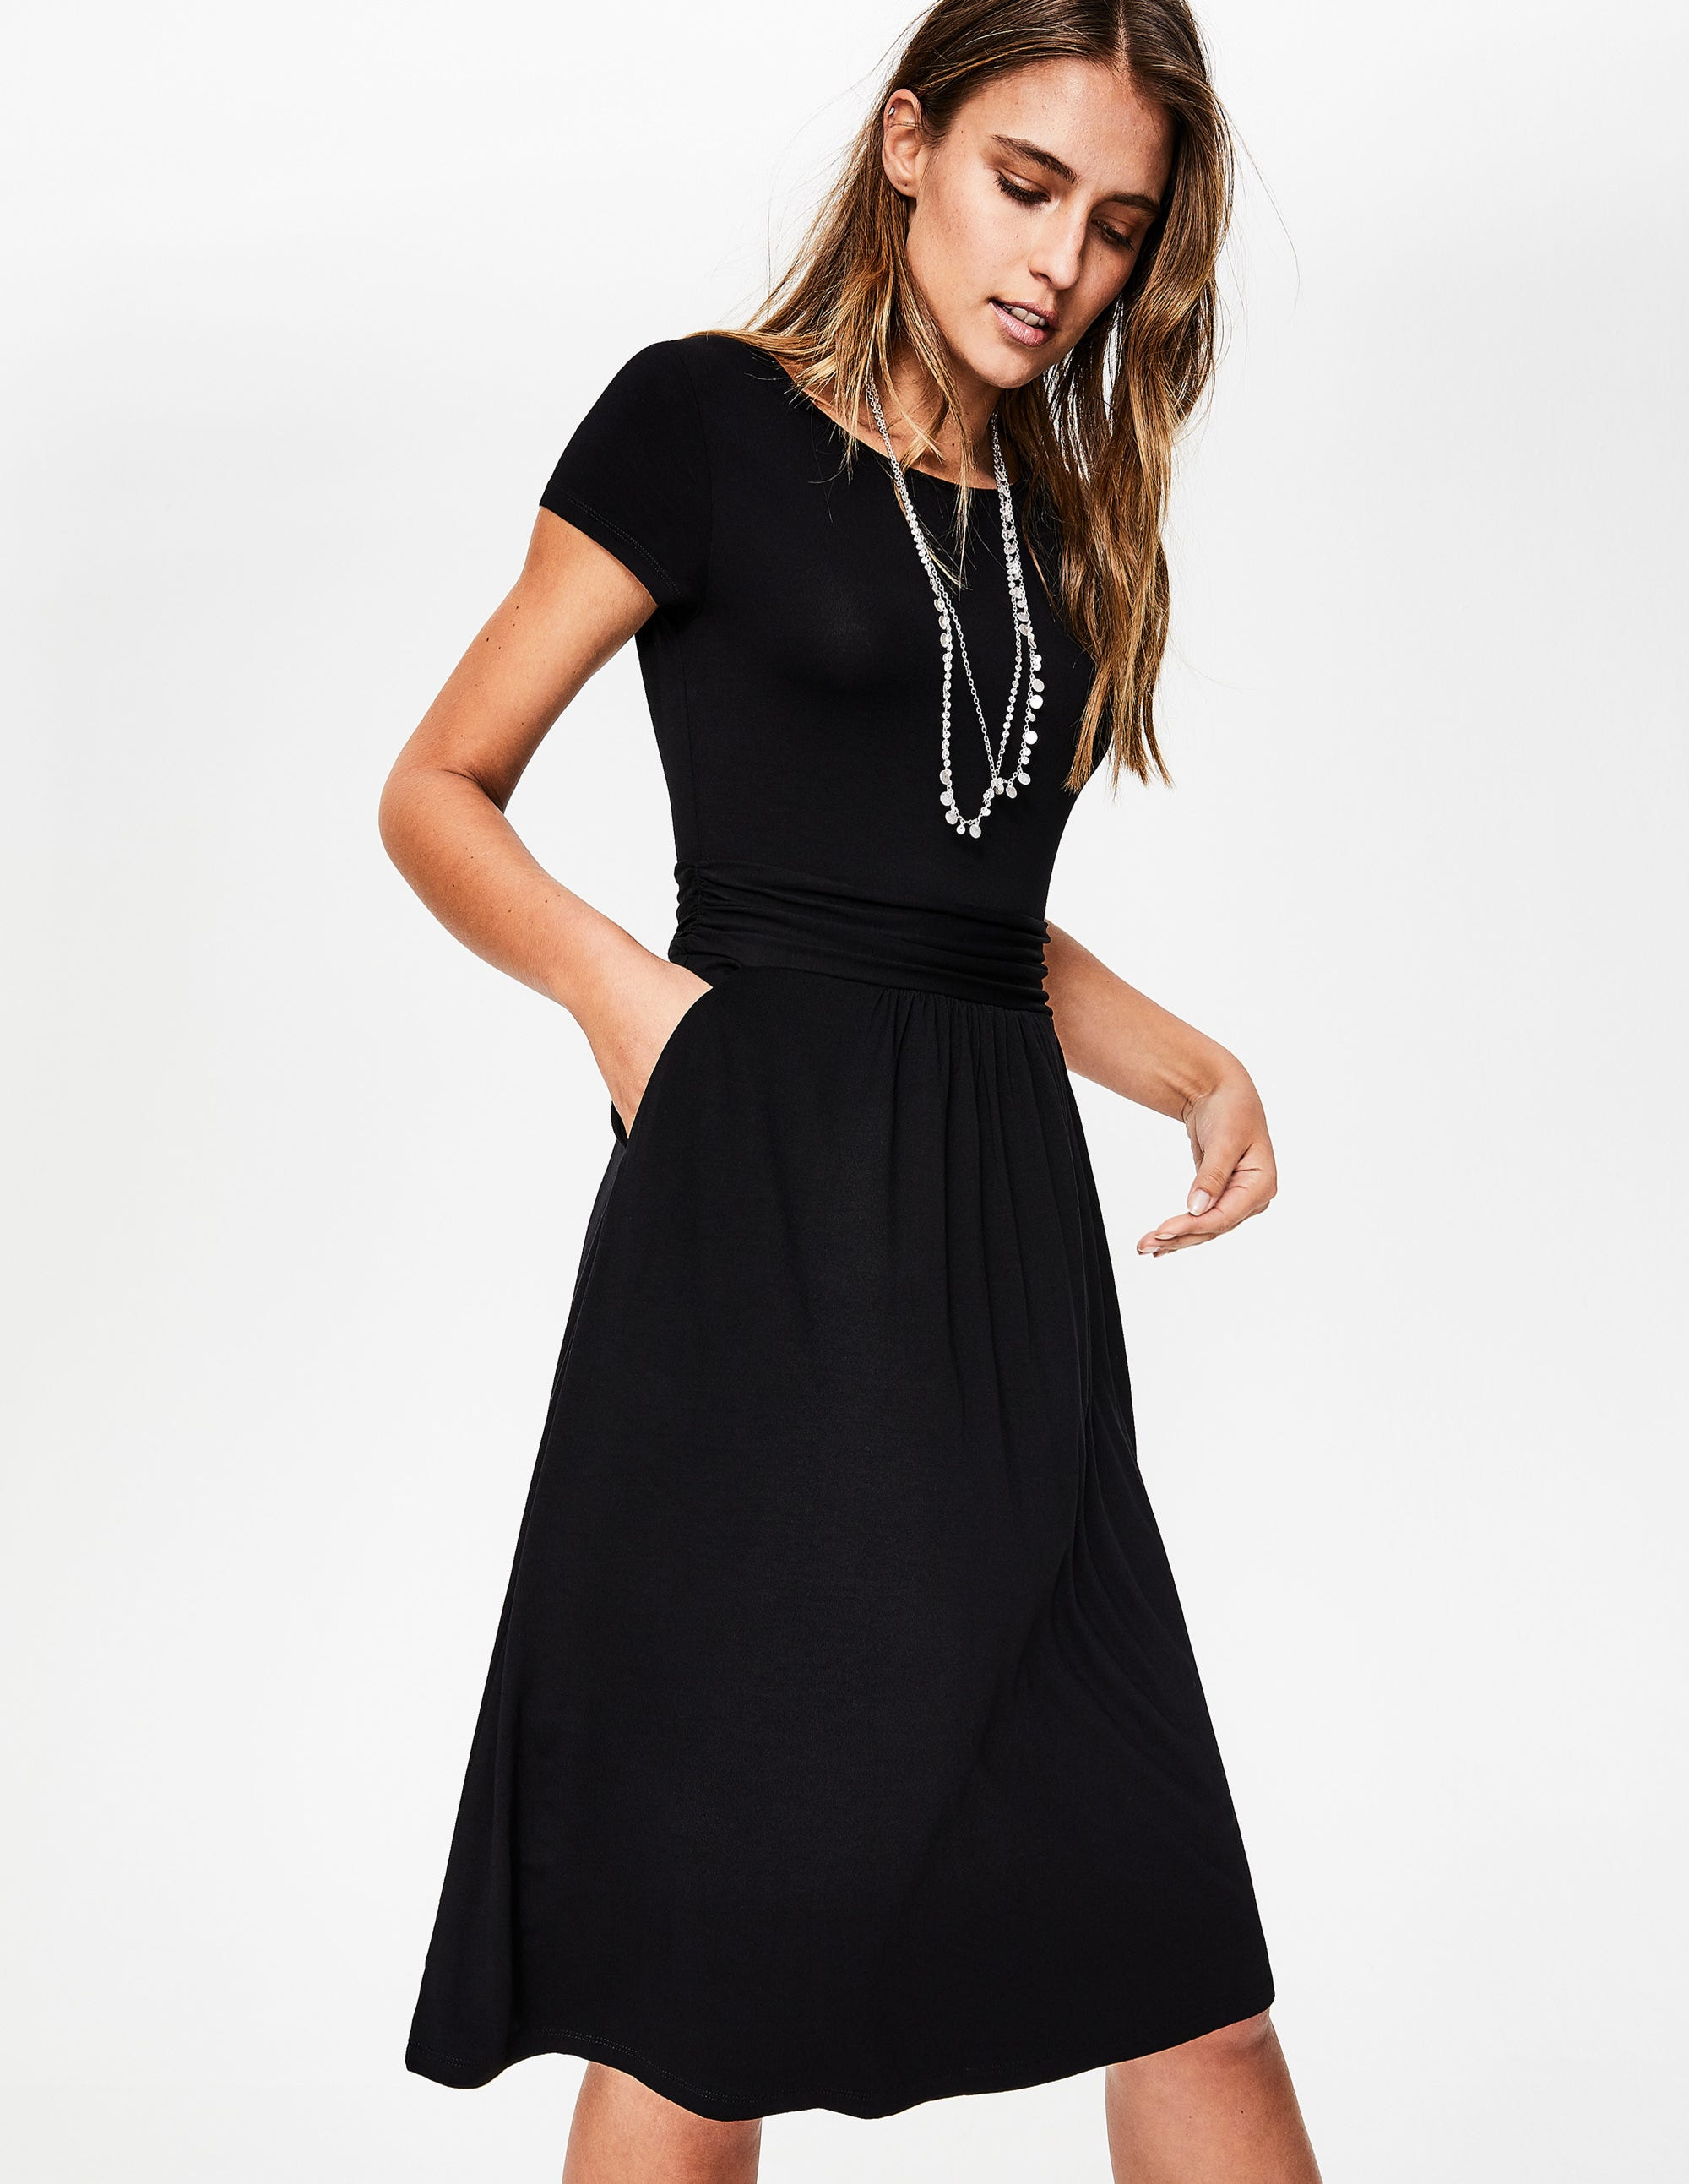 a5c1e13ac Amelie Jersey Dress - Black